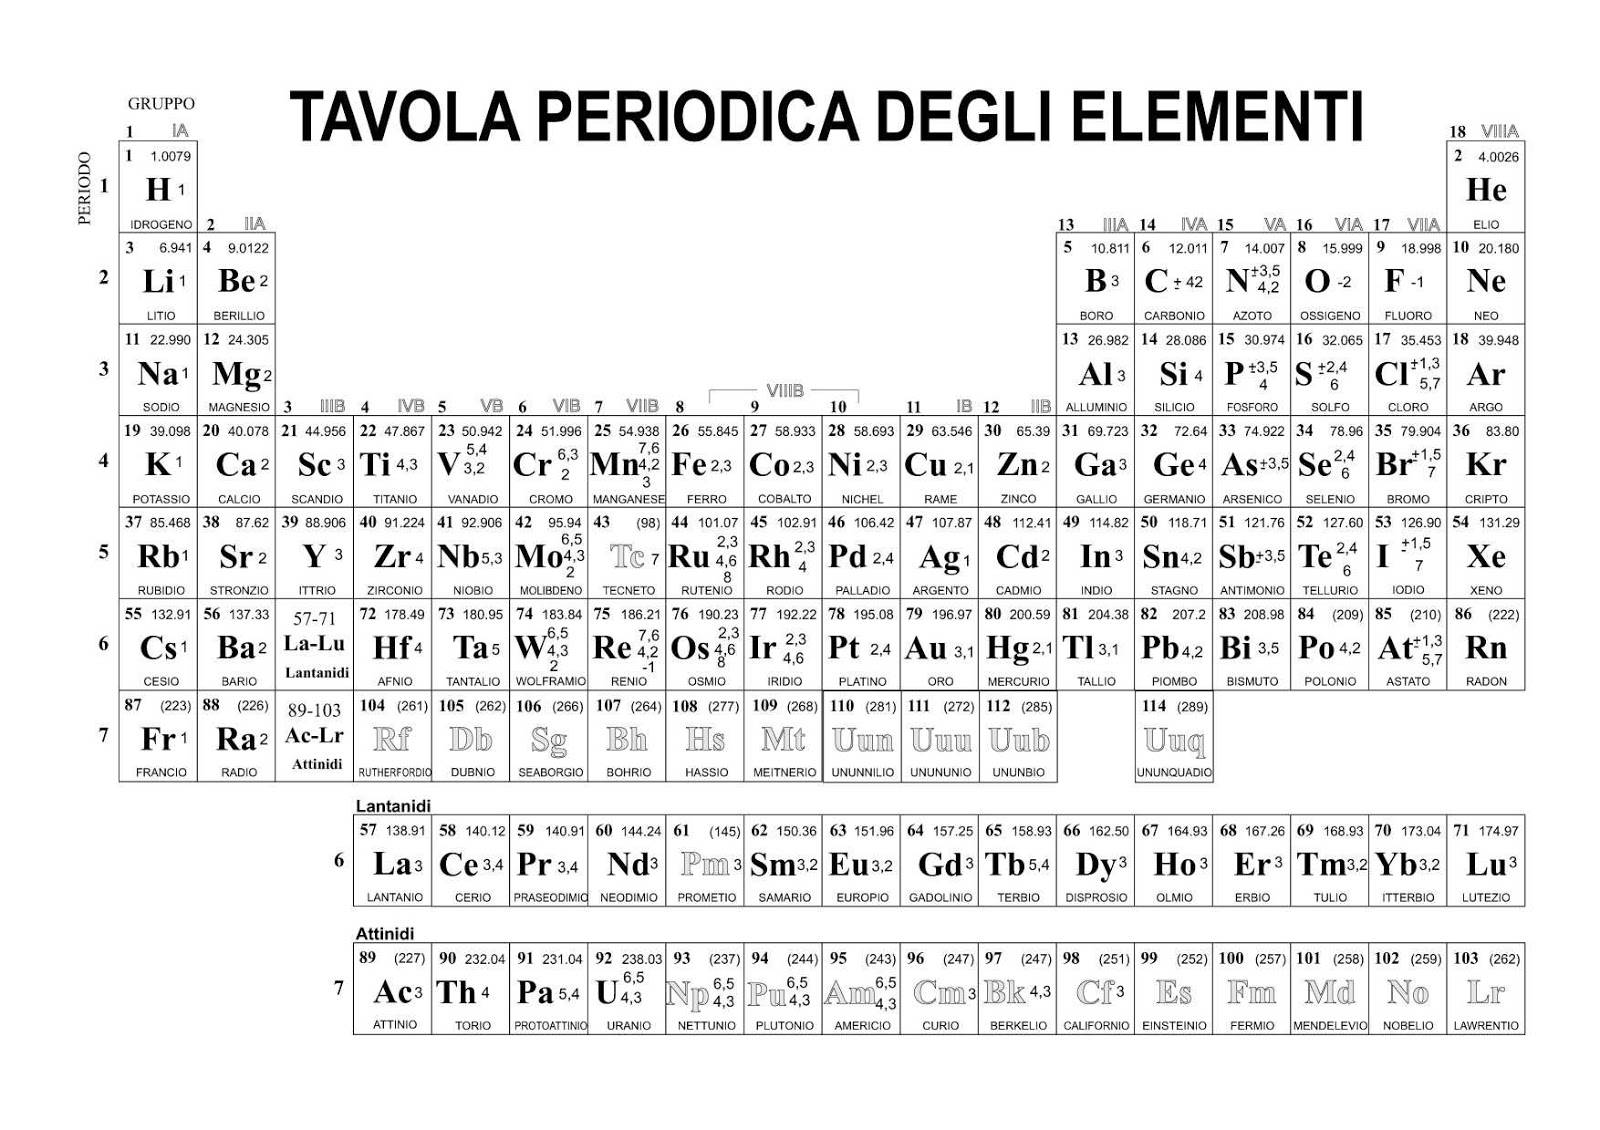 The chemistry of elements tavola periodica degli elementi - Numero elementi tavola periodica ...